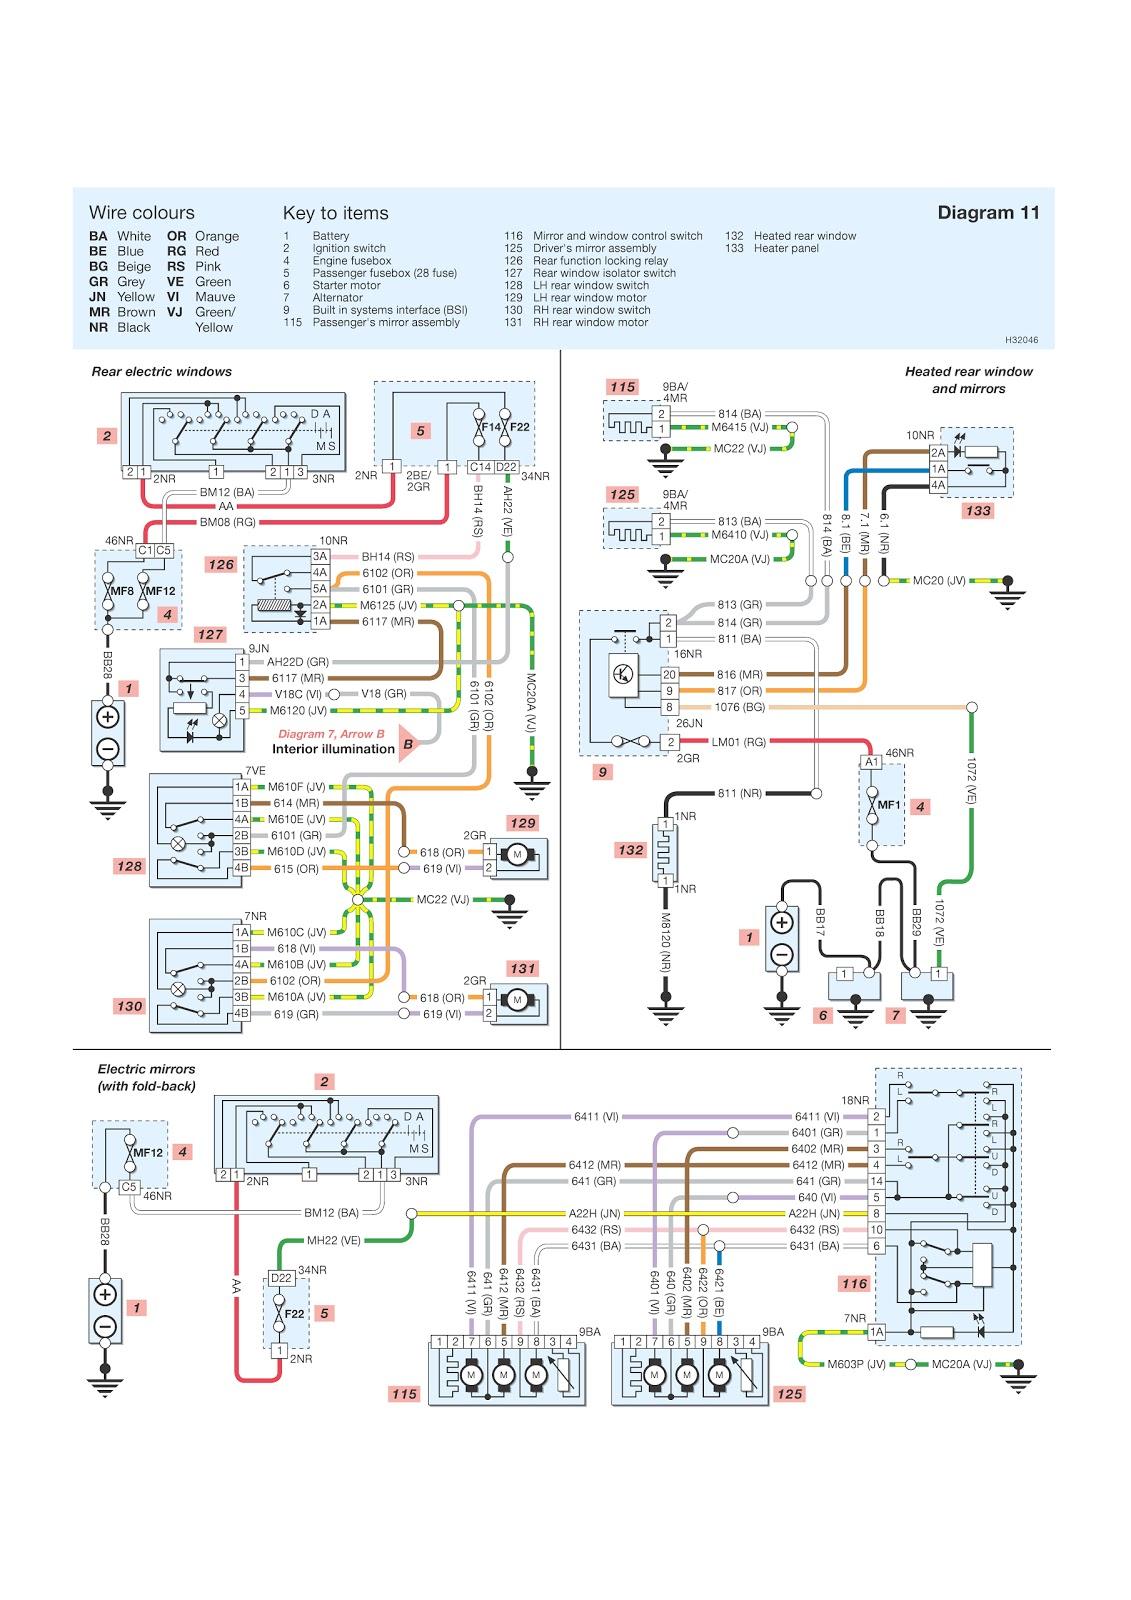 wire diagram wire diagrams wiring diagram wiring diagrams color rh bsmdot co